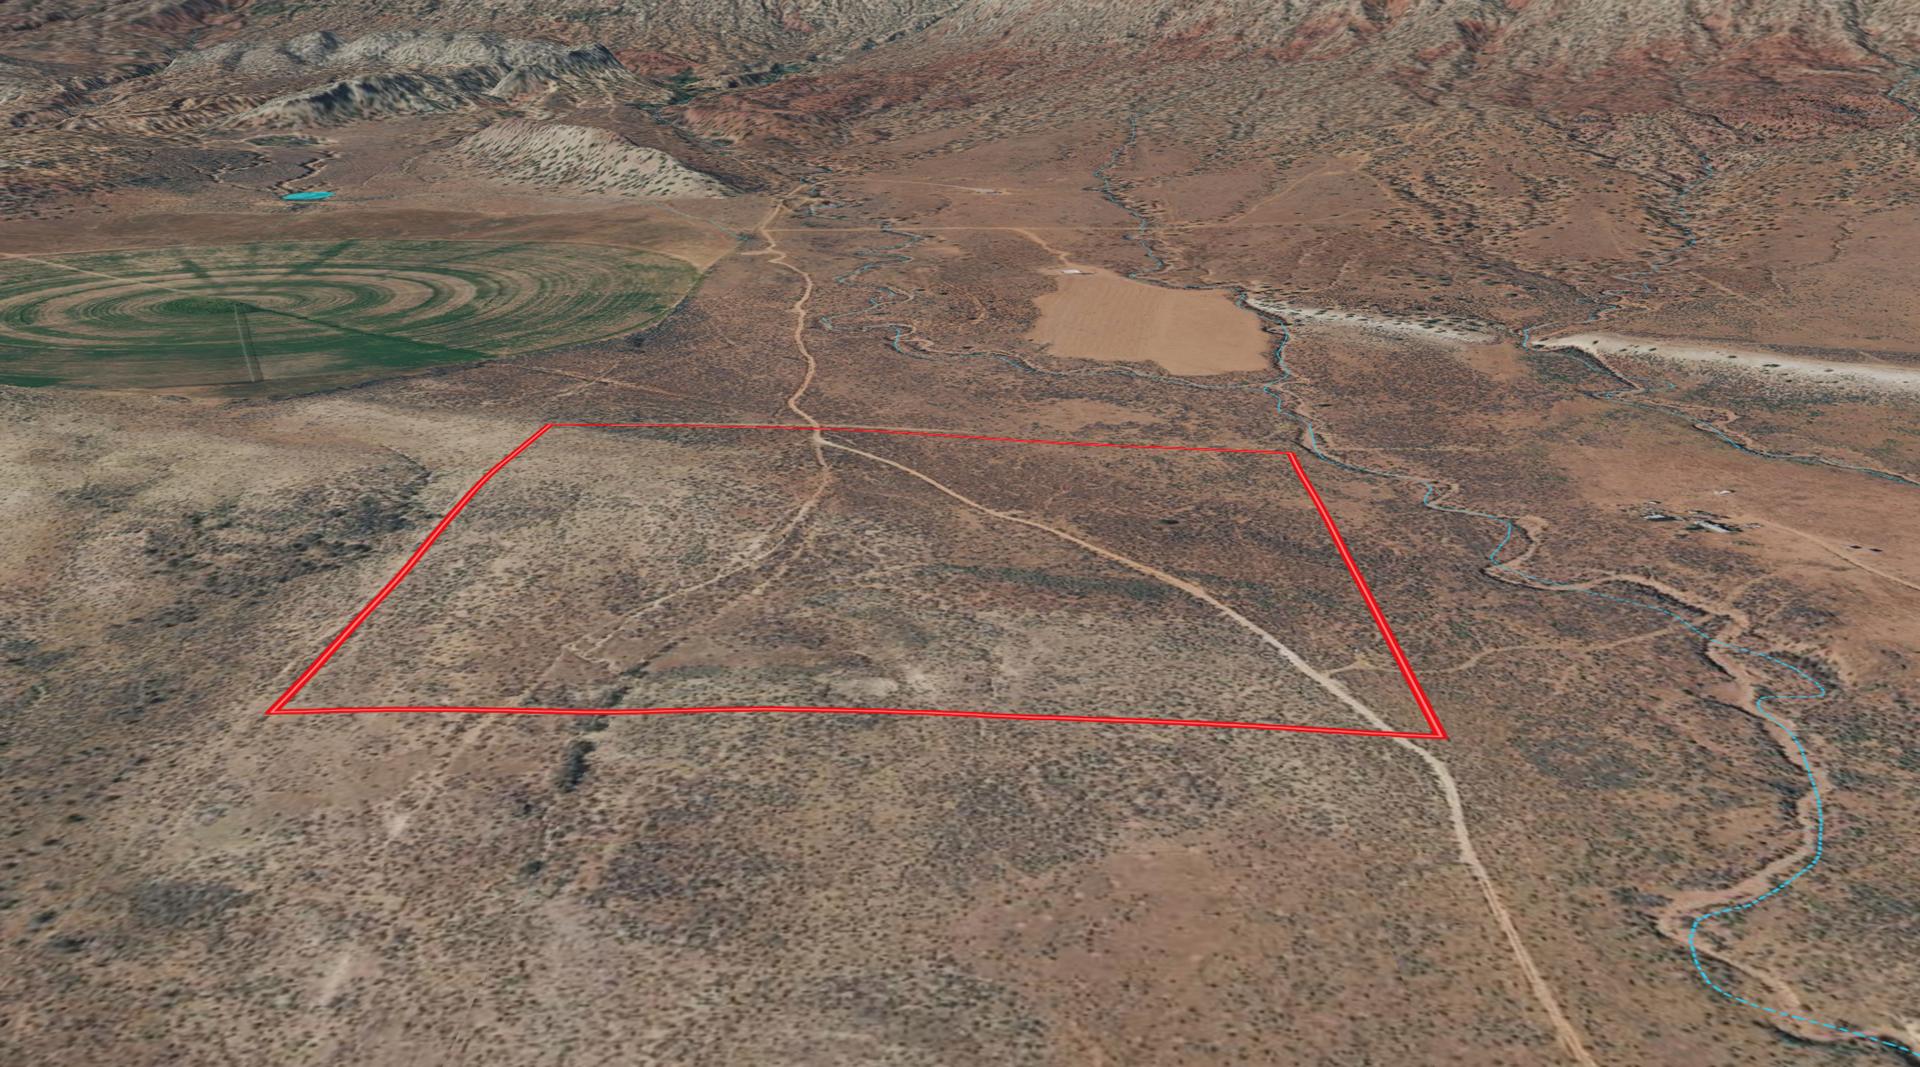 Colorado Mountain Desert Land For Sale with Canyon Views